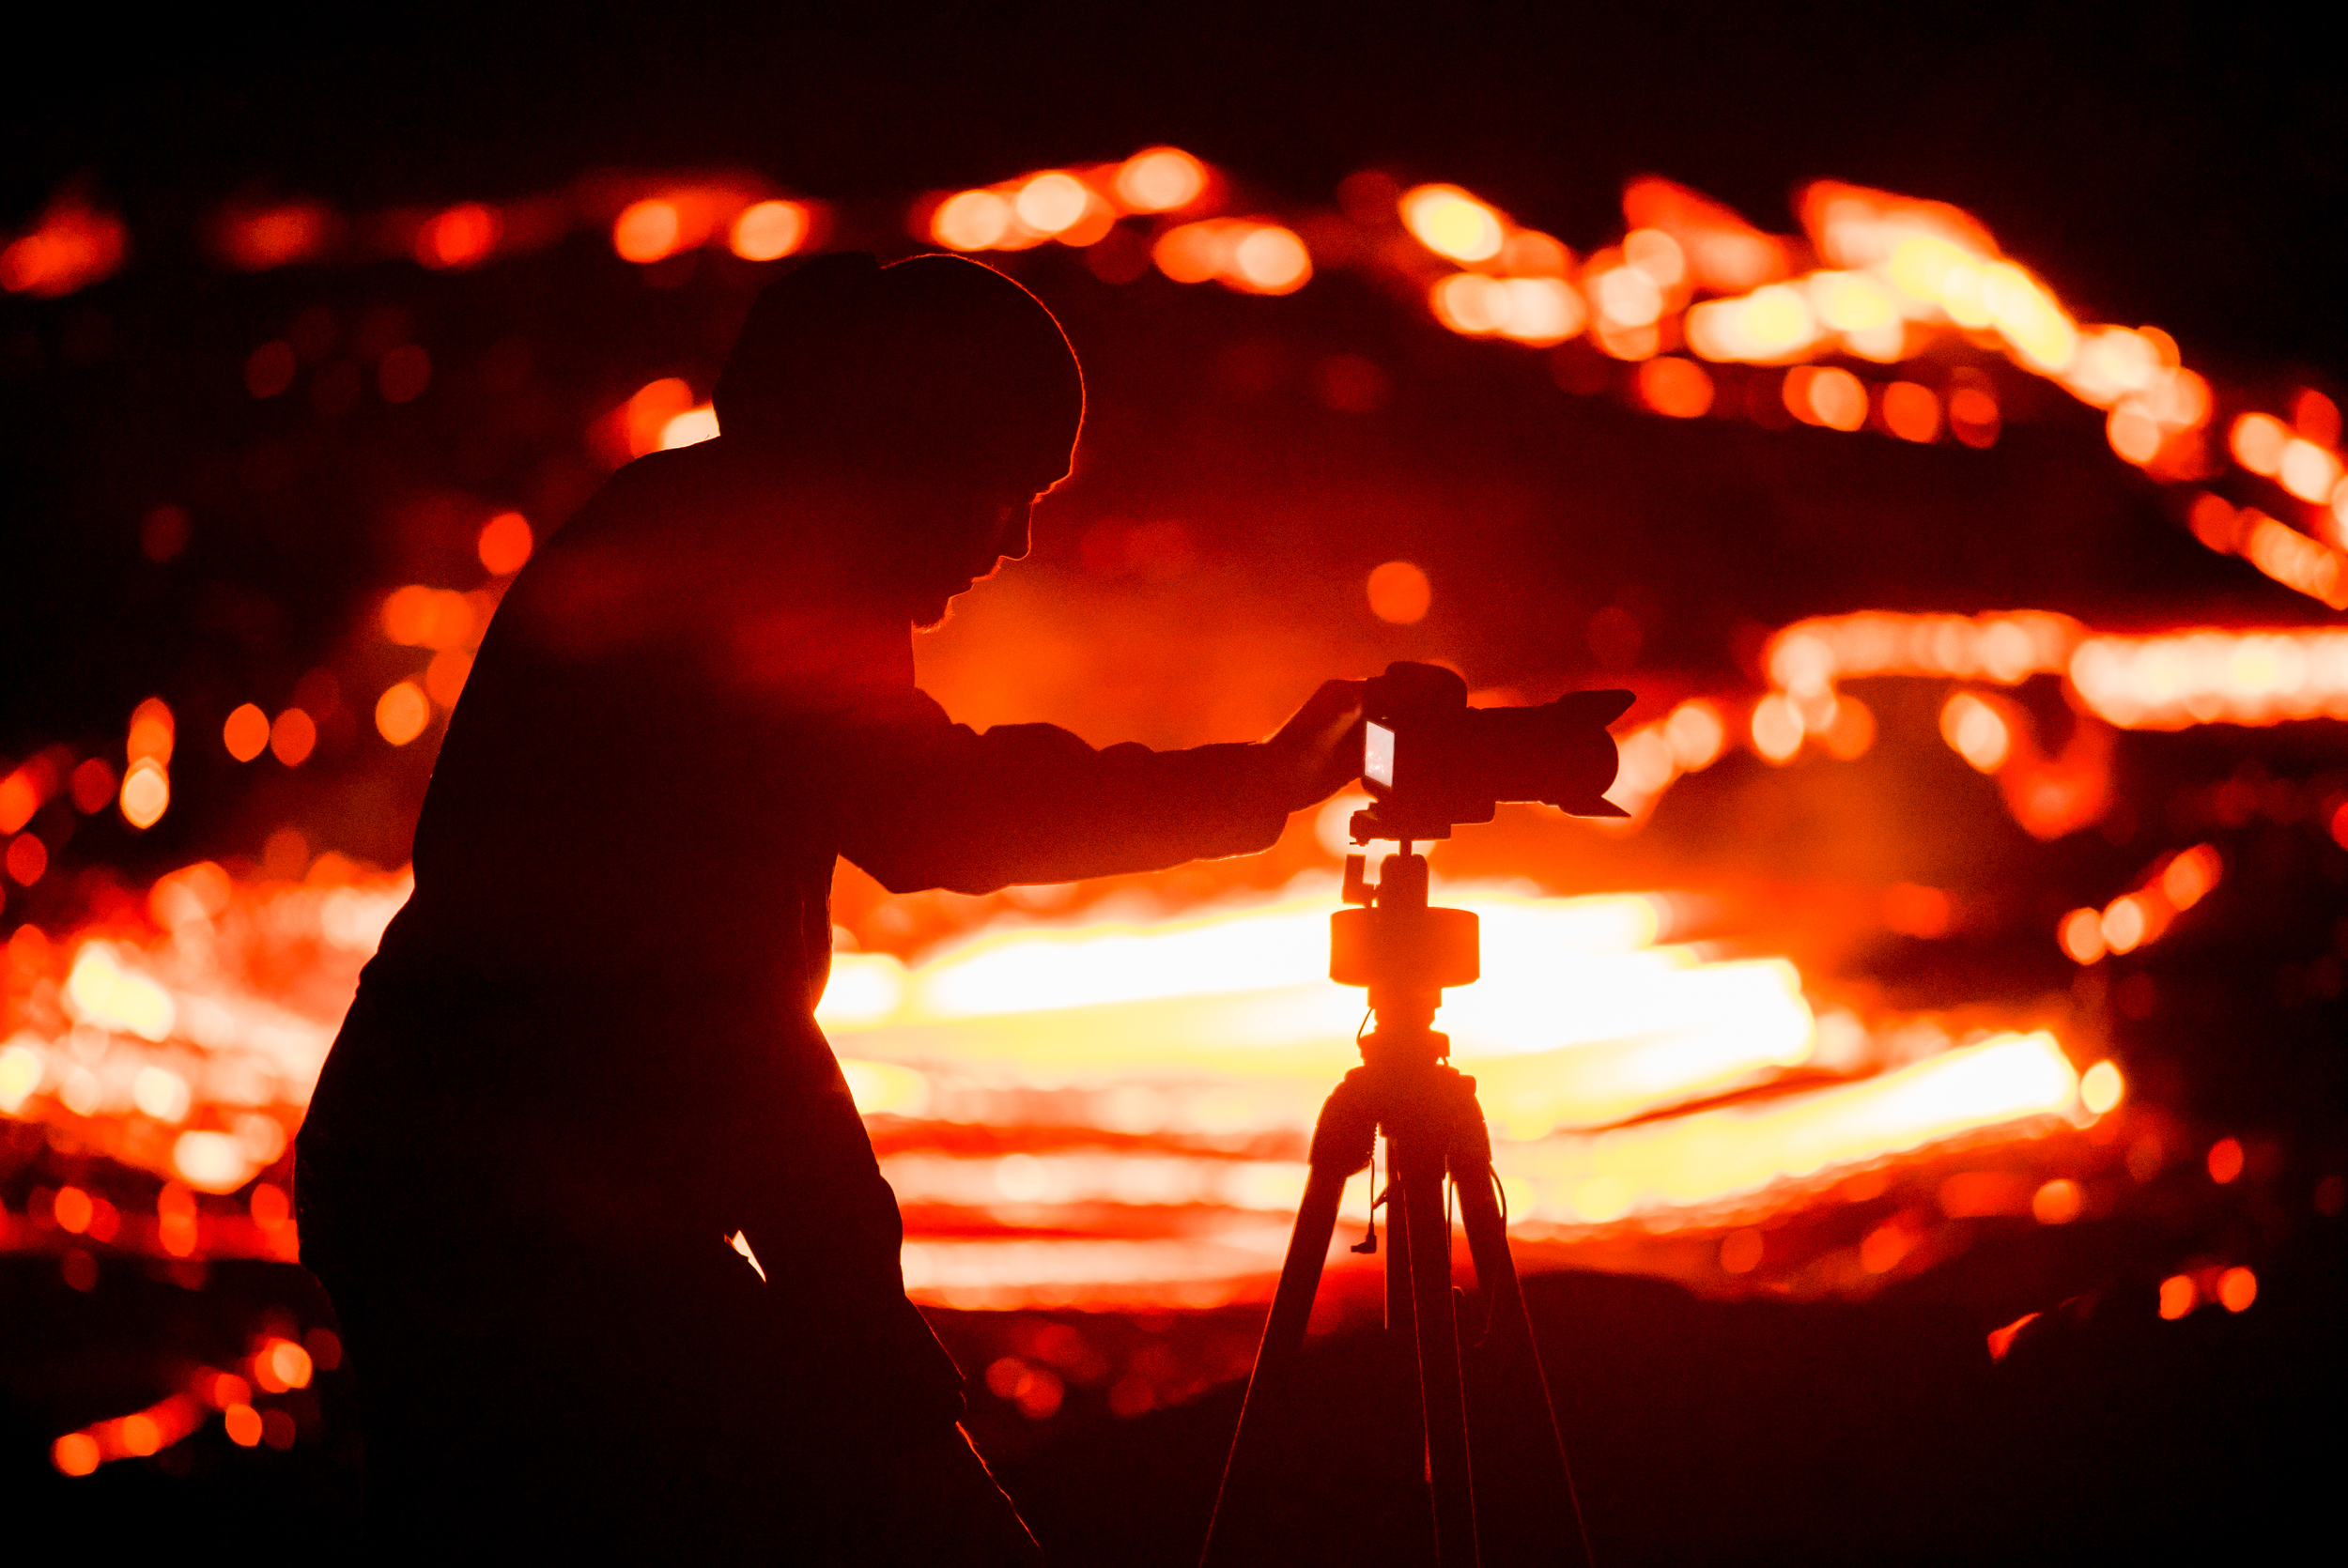 Tyler filming lava